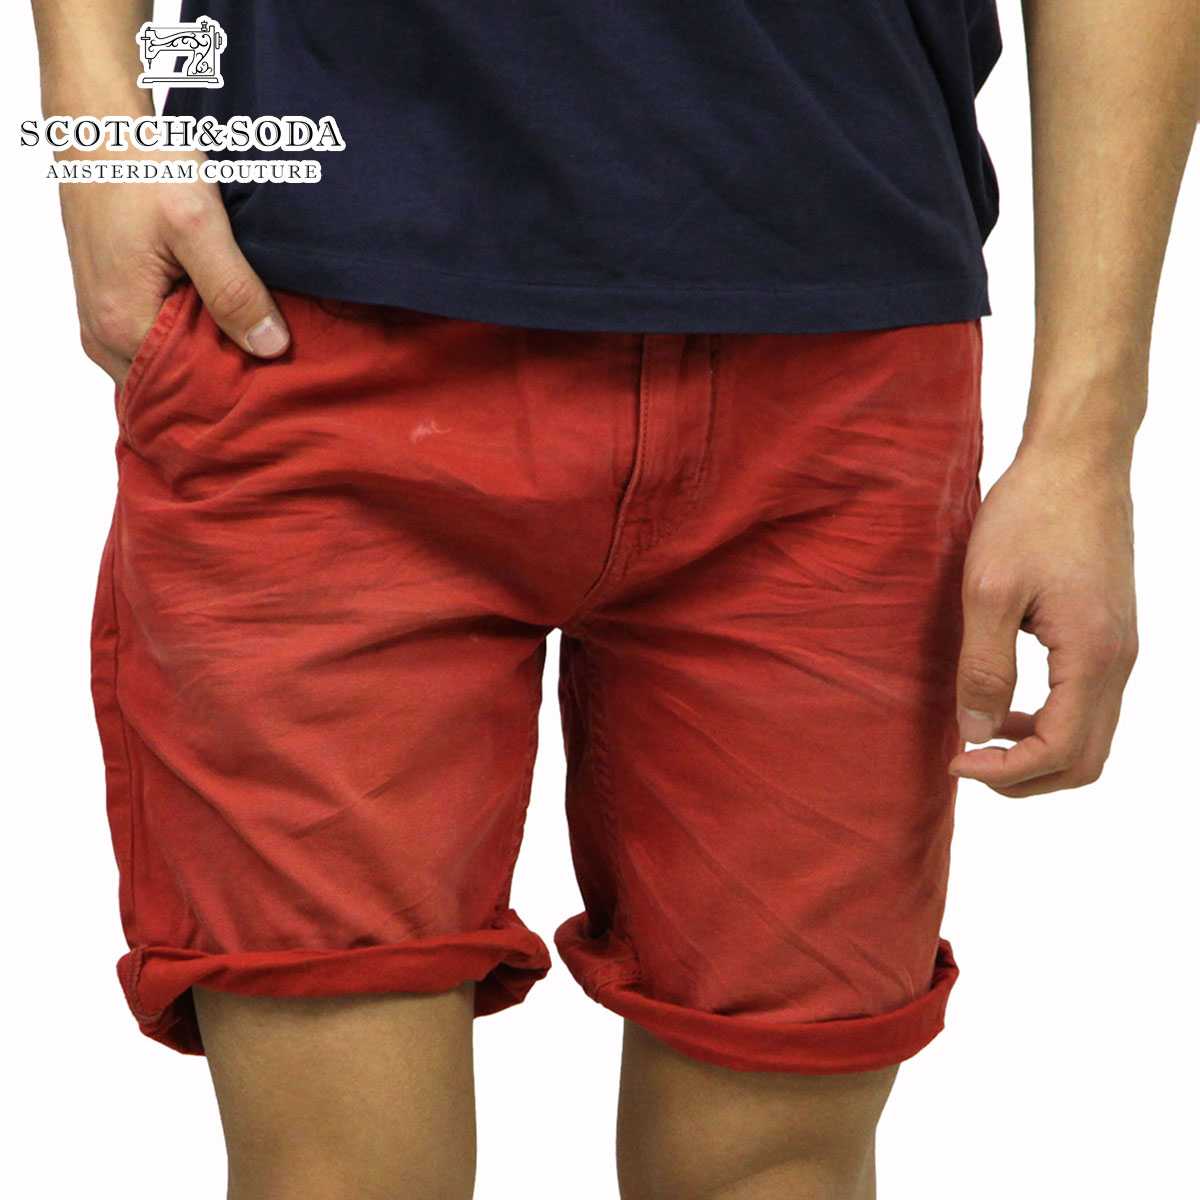 25%OFFセール 【販売期間 4/22 09:00〜4/26 09:59】 スコッチアンドソーダ SCOTCH&SODA 正規販売店 メンズ ショートパンツ Freeman Chino short - Canvas Garment Dyes 87093 30 D15S25